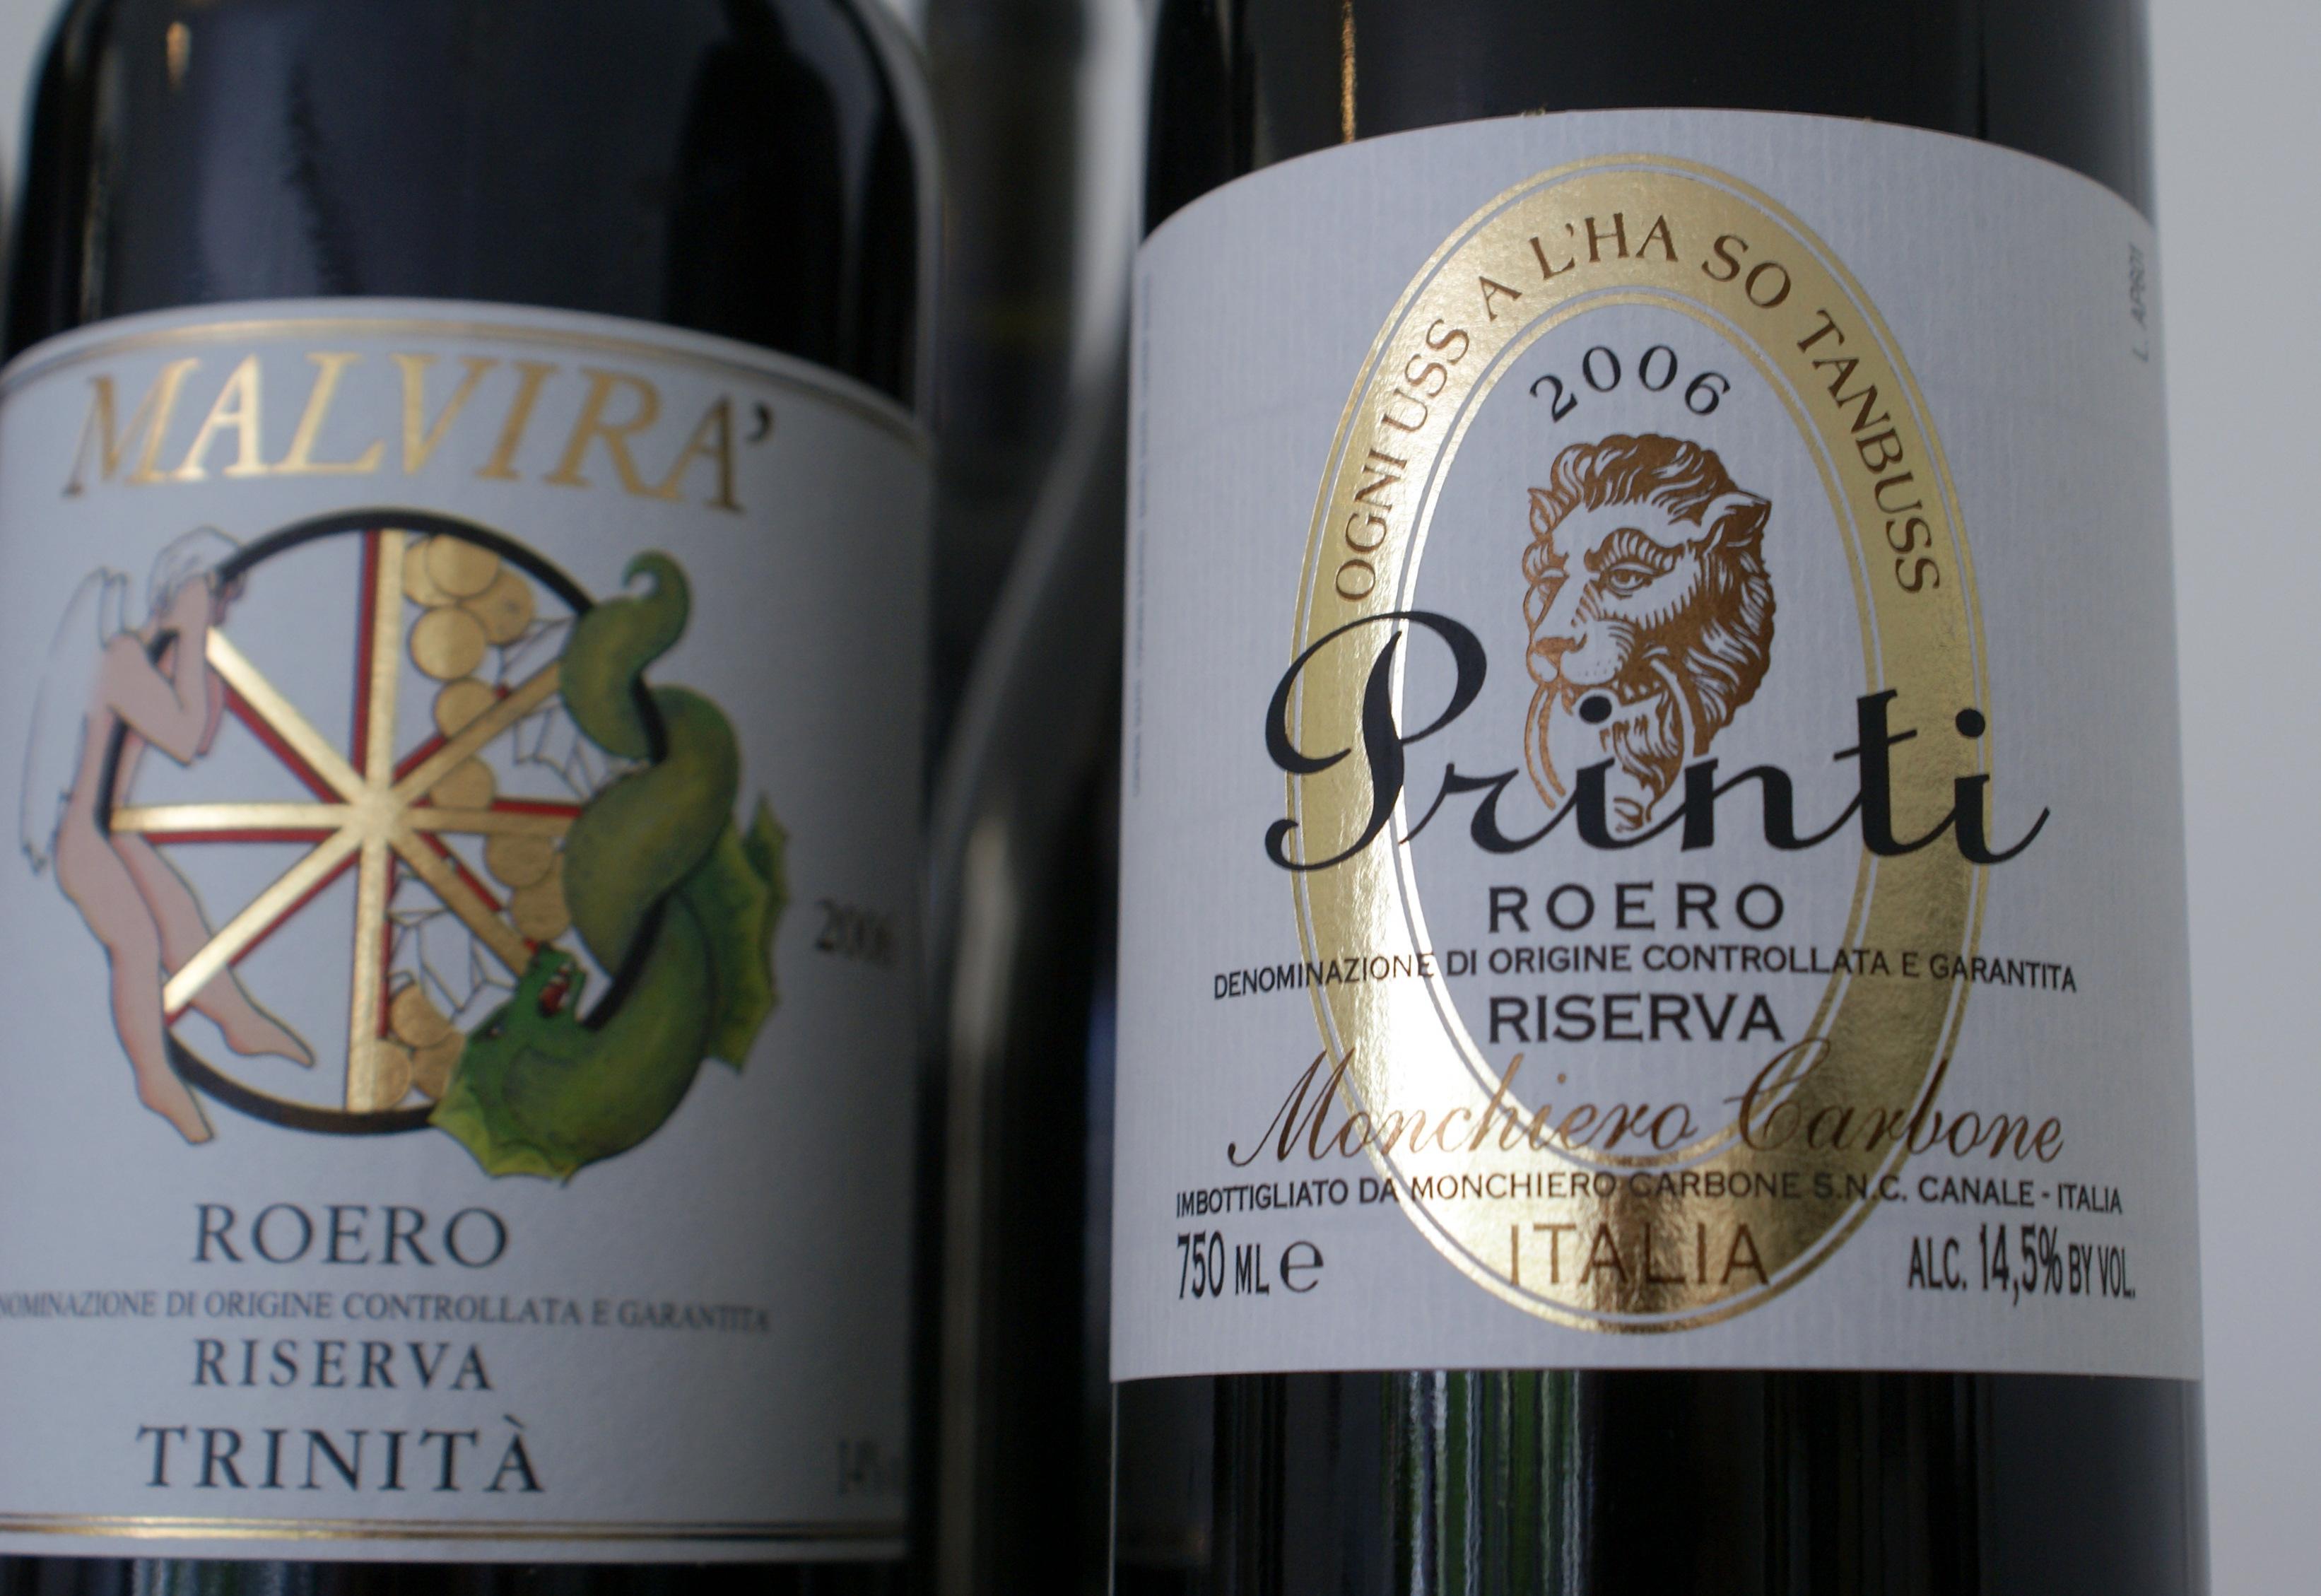 Two top Roero Riserva bottlings.